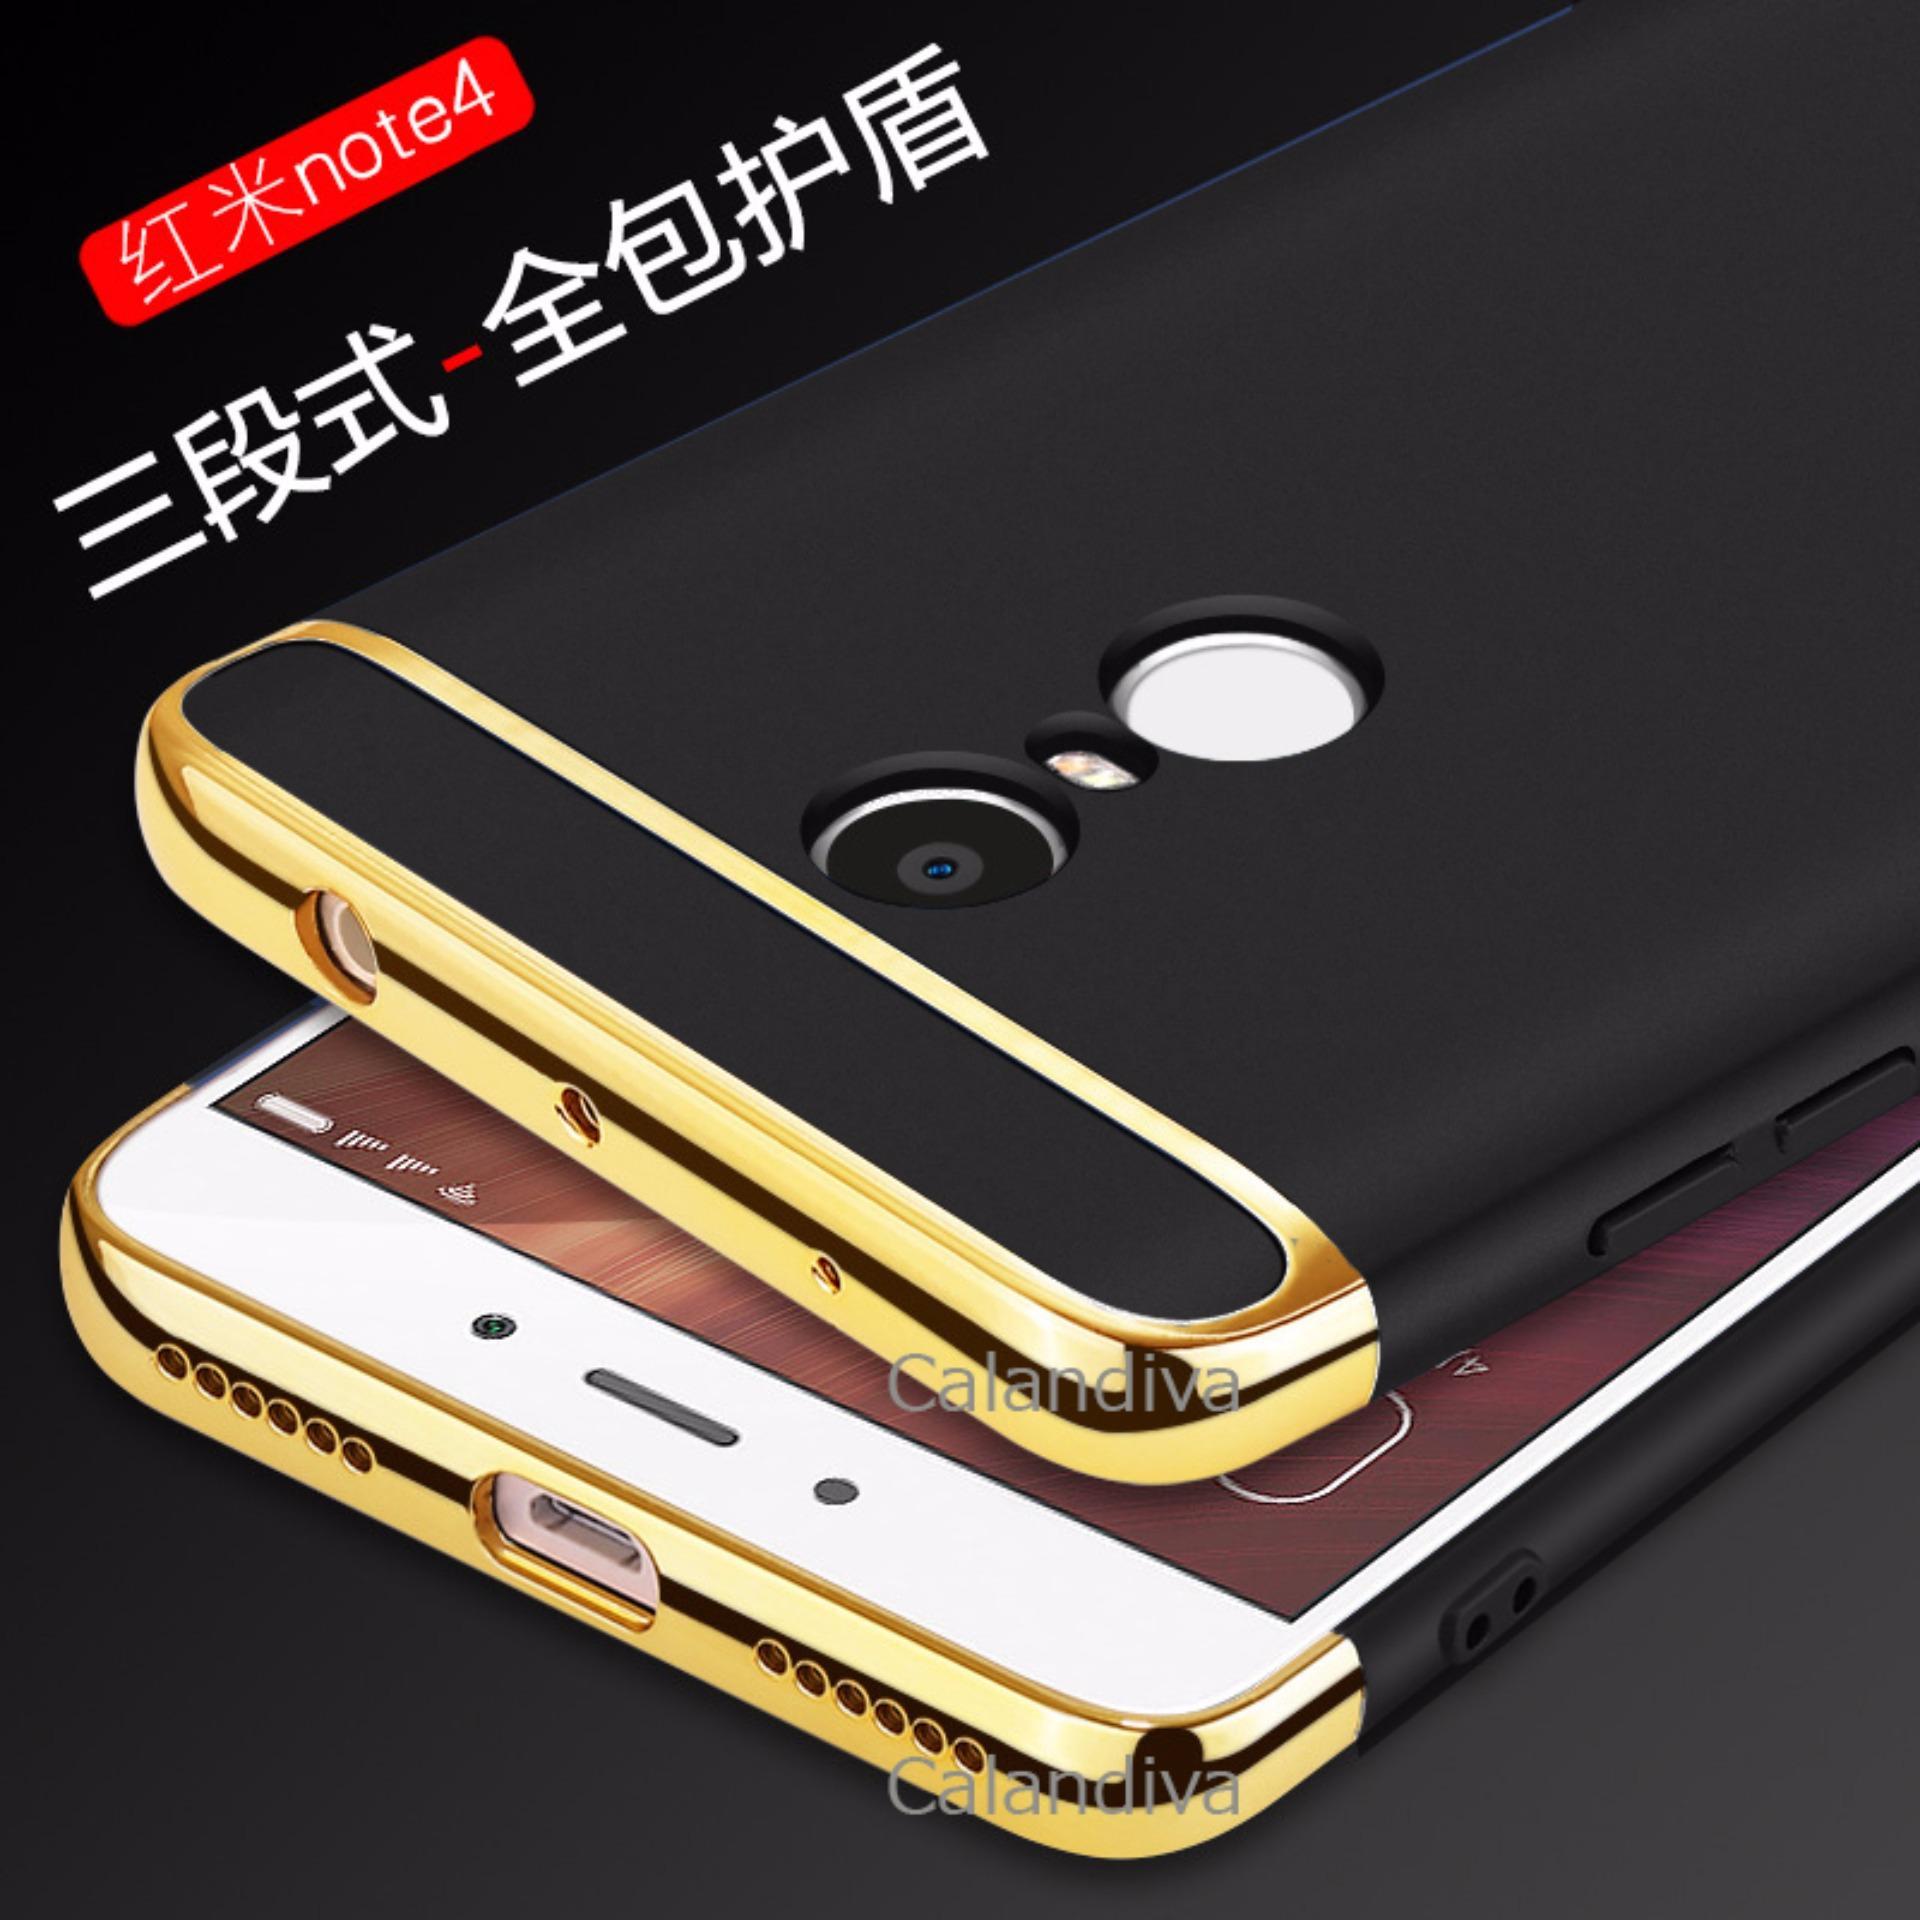 Calandiva Premium Quality Elegance Protection Hardcase for Xiaomi Redmi  Note 4 Mediatek   Redmi Note 4x ... 2af754dd00